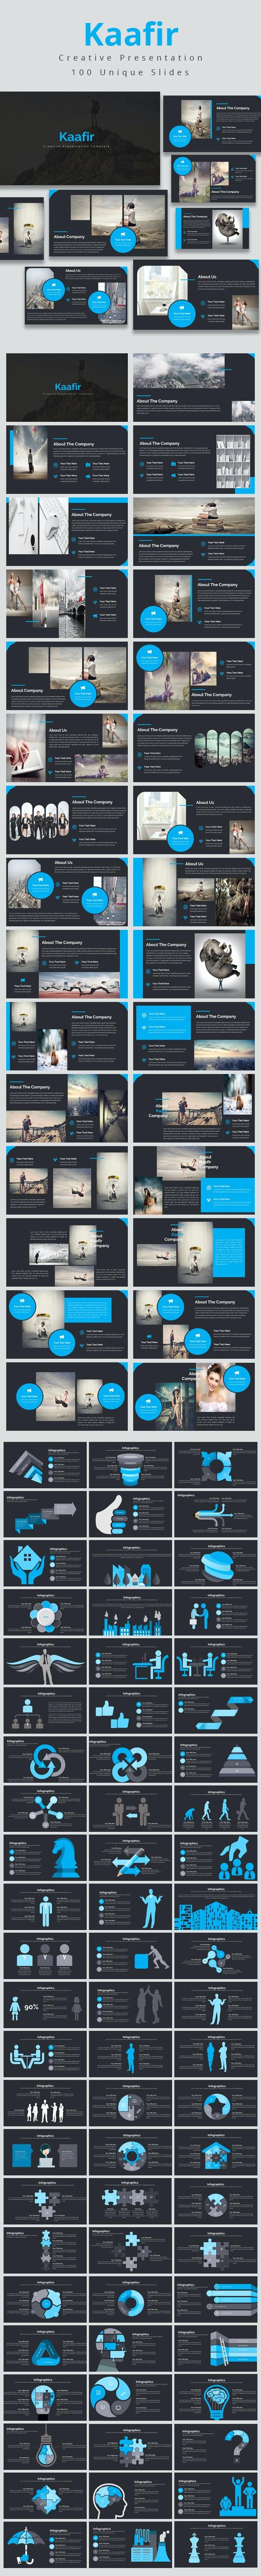 Kaafir Multi-purpose Powerpoint Template - Business PowerPoint Templates